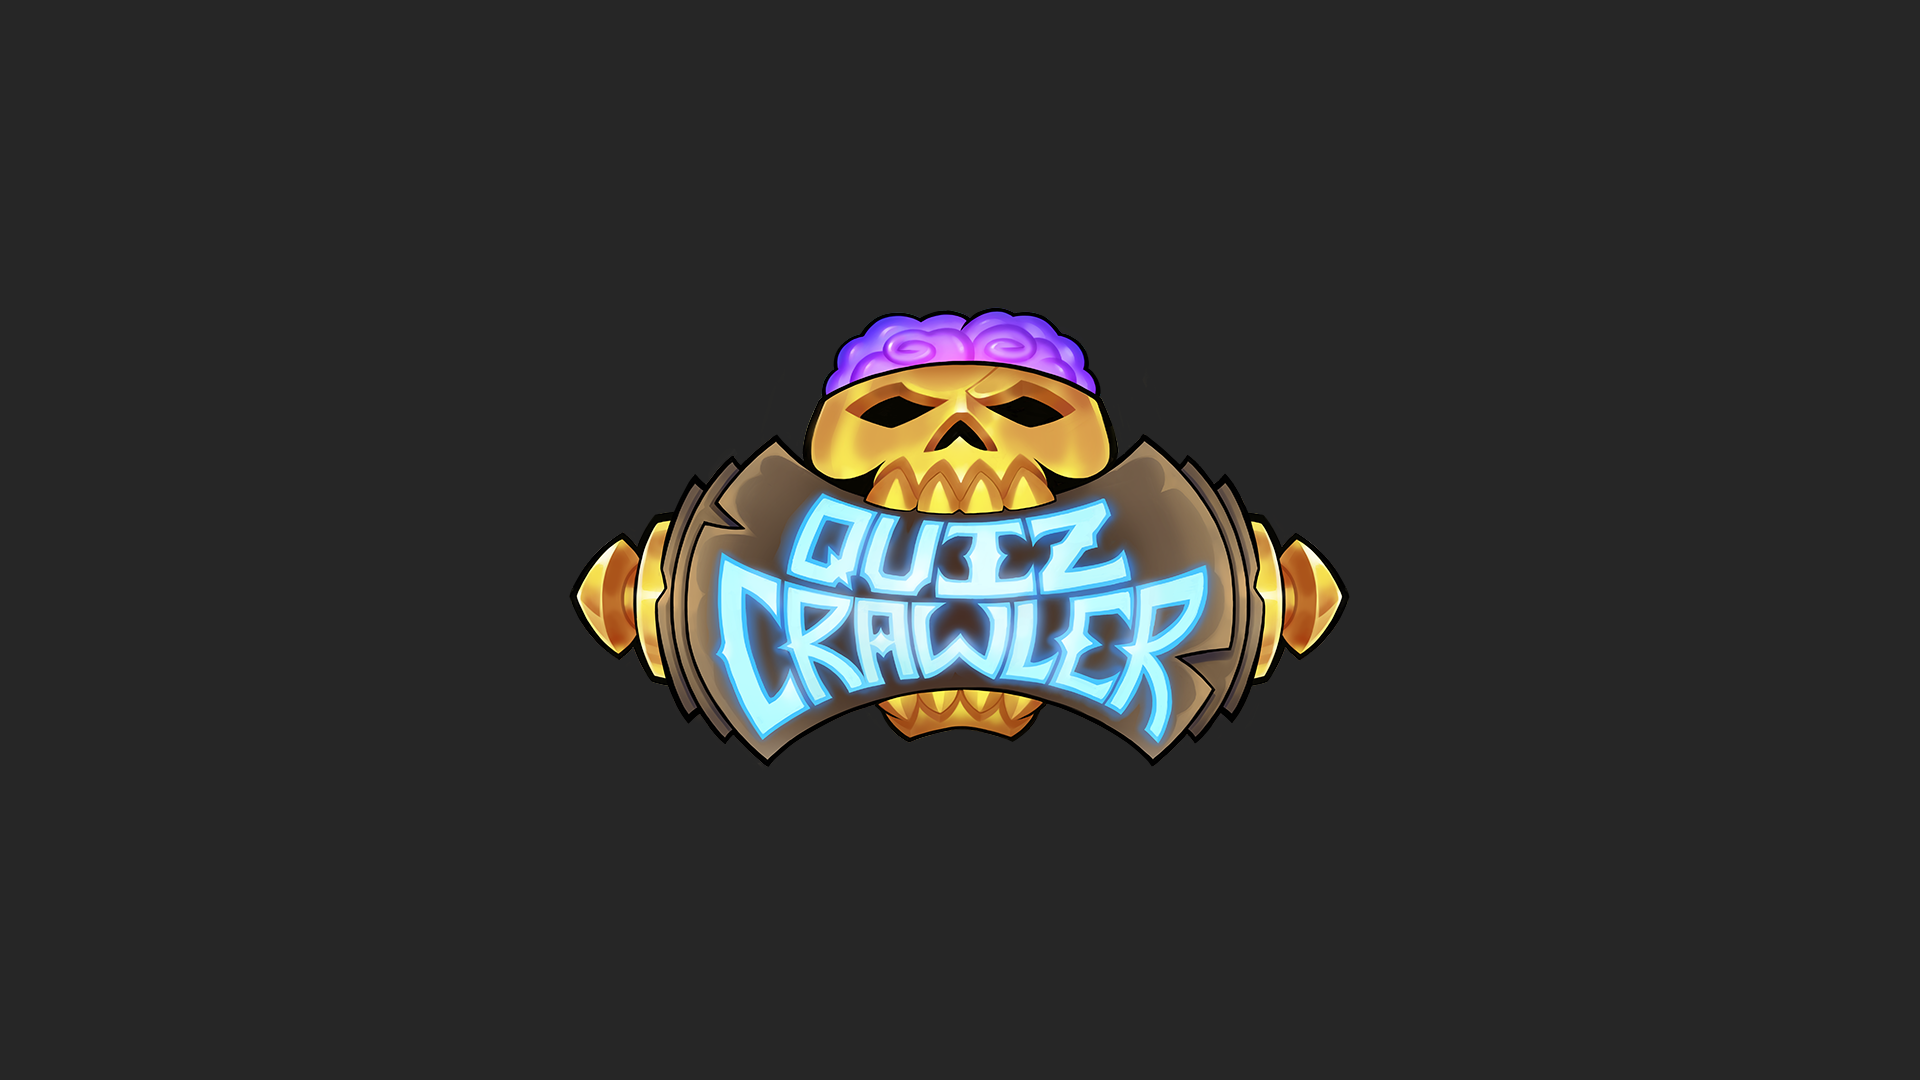 Quiz Crawler Logo Wallpaper.png